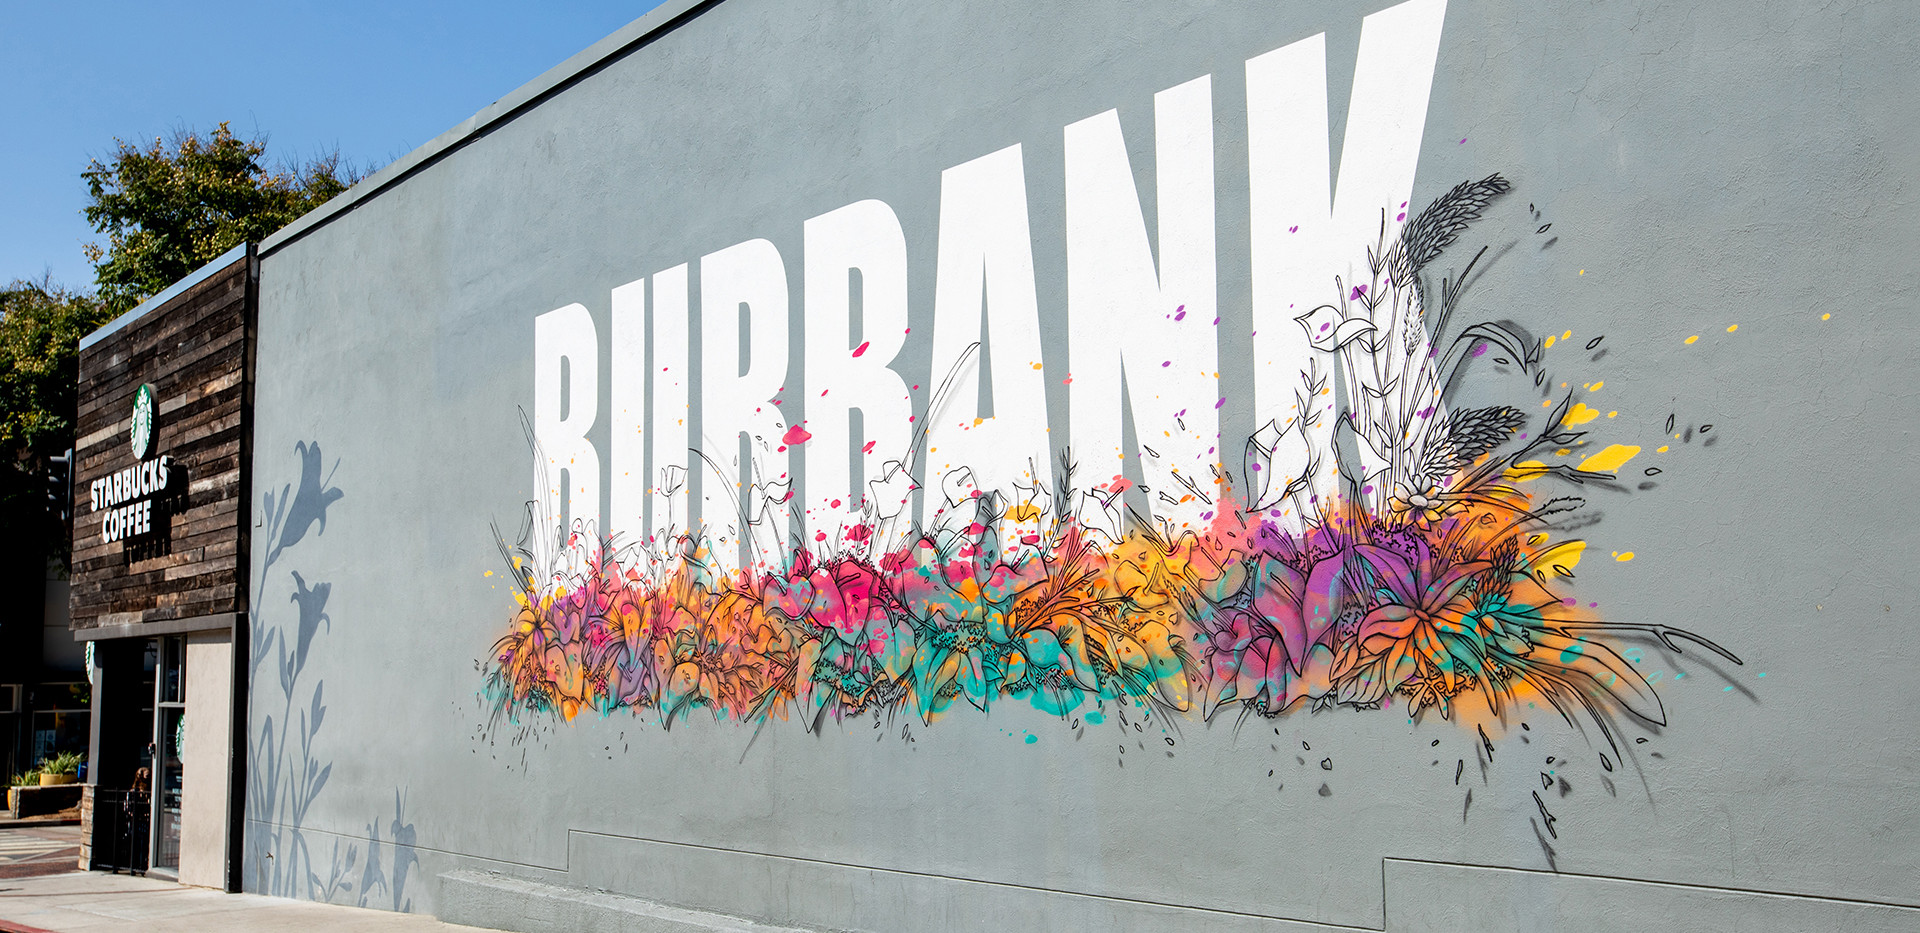 Downtown Burbank